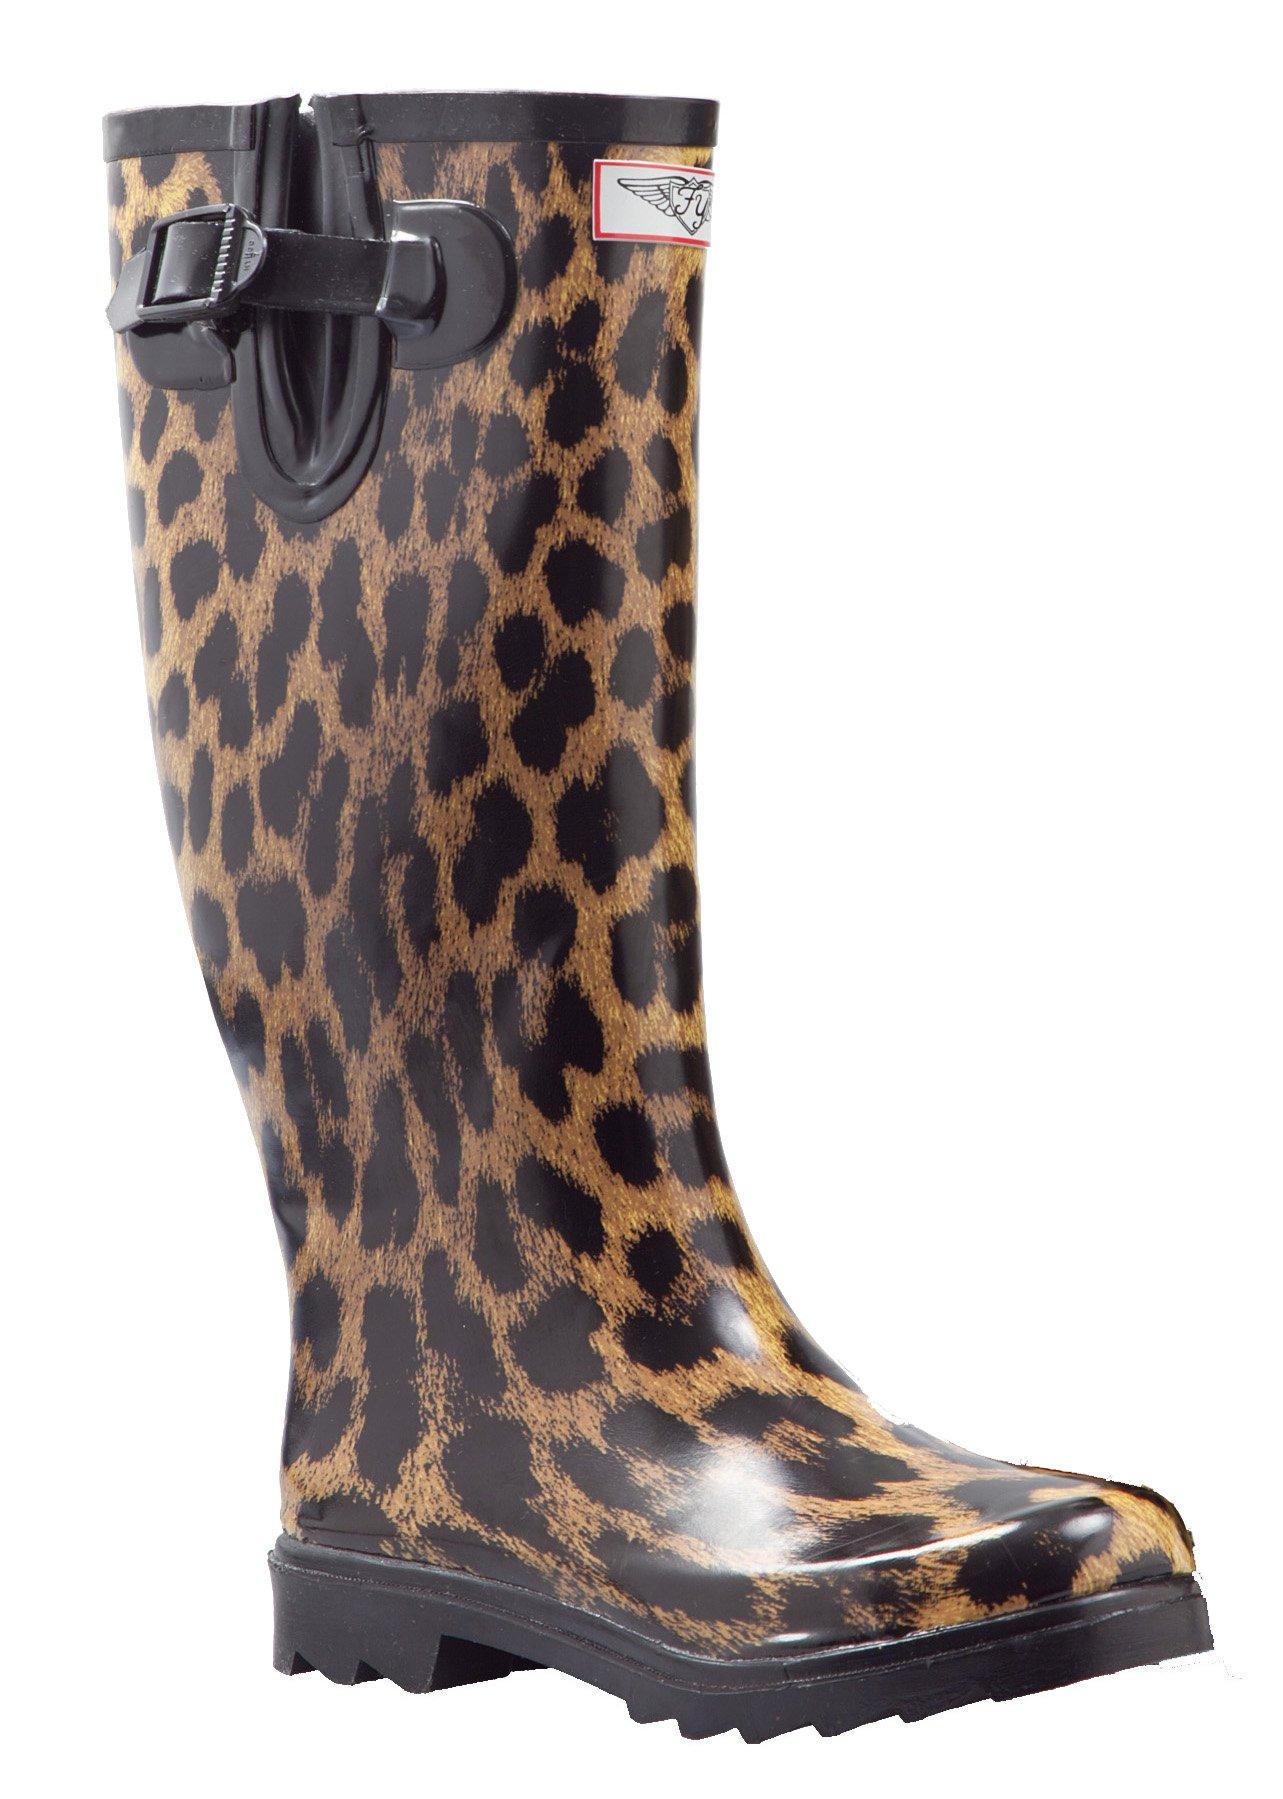 Women Rubber Rain Boots Cotton Lining, Safari Animal Prints (Leopard, 6)